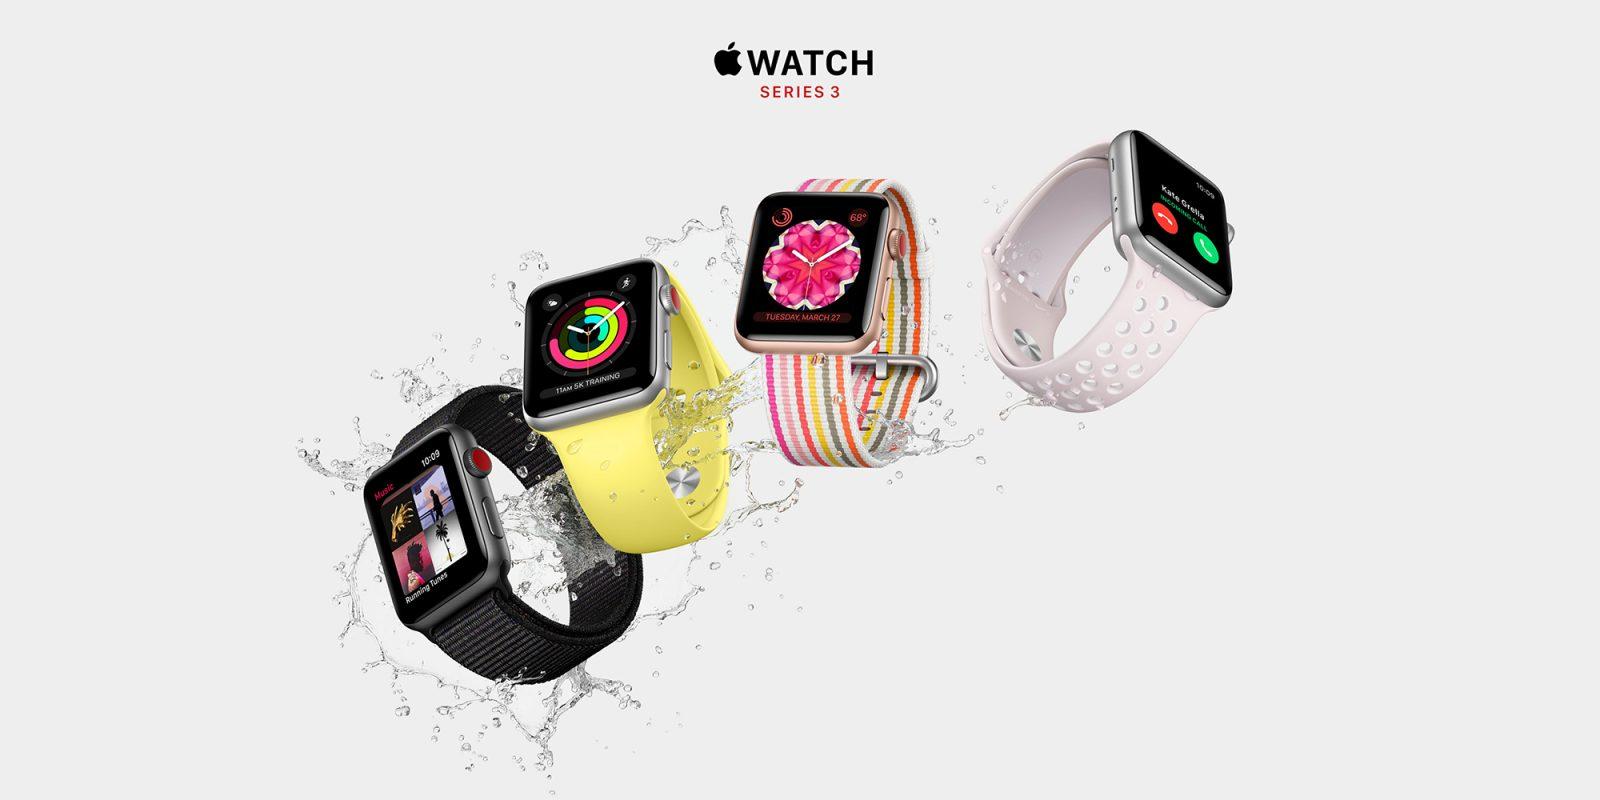 Best Buy discounts Apple Watch Series 3 in its 20 Days of Doorbusters sale 7ffdca9ad1e9